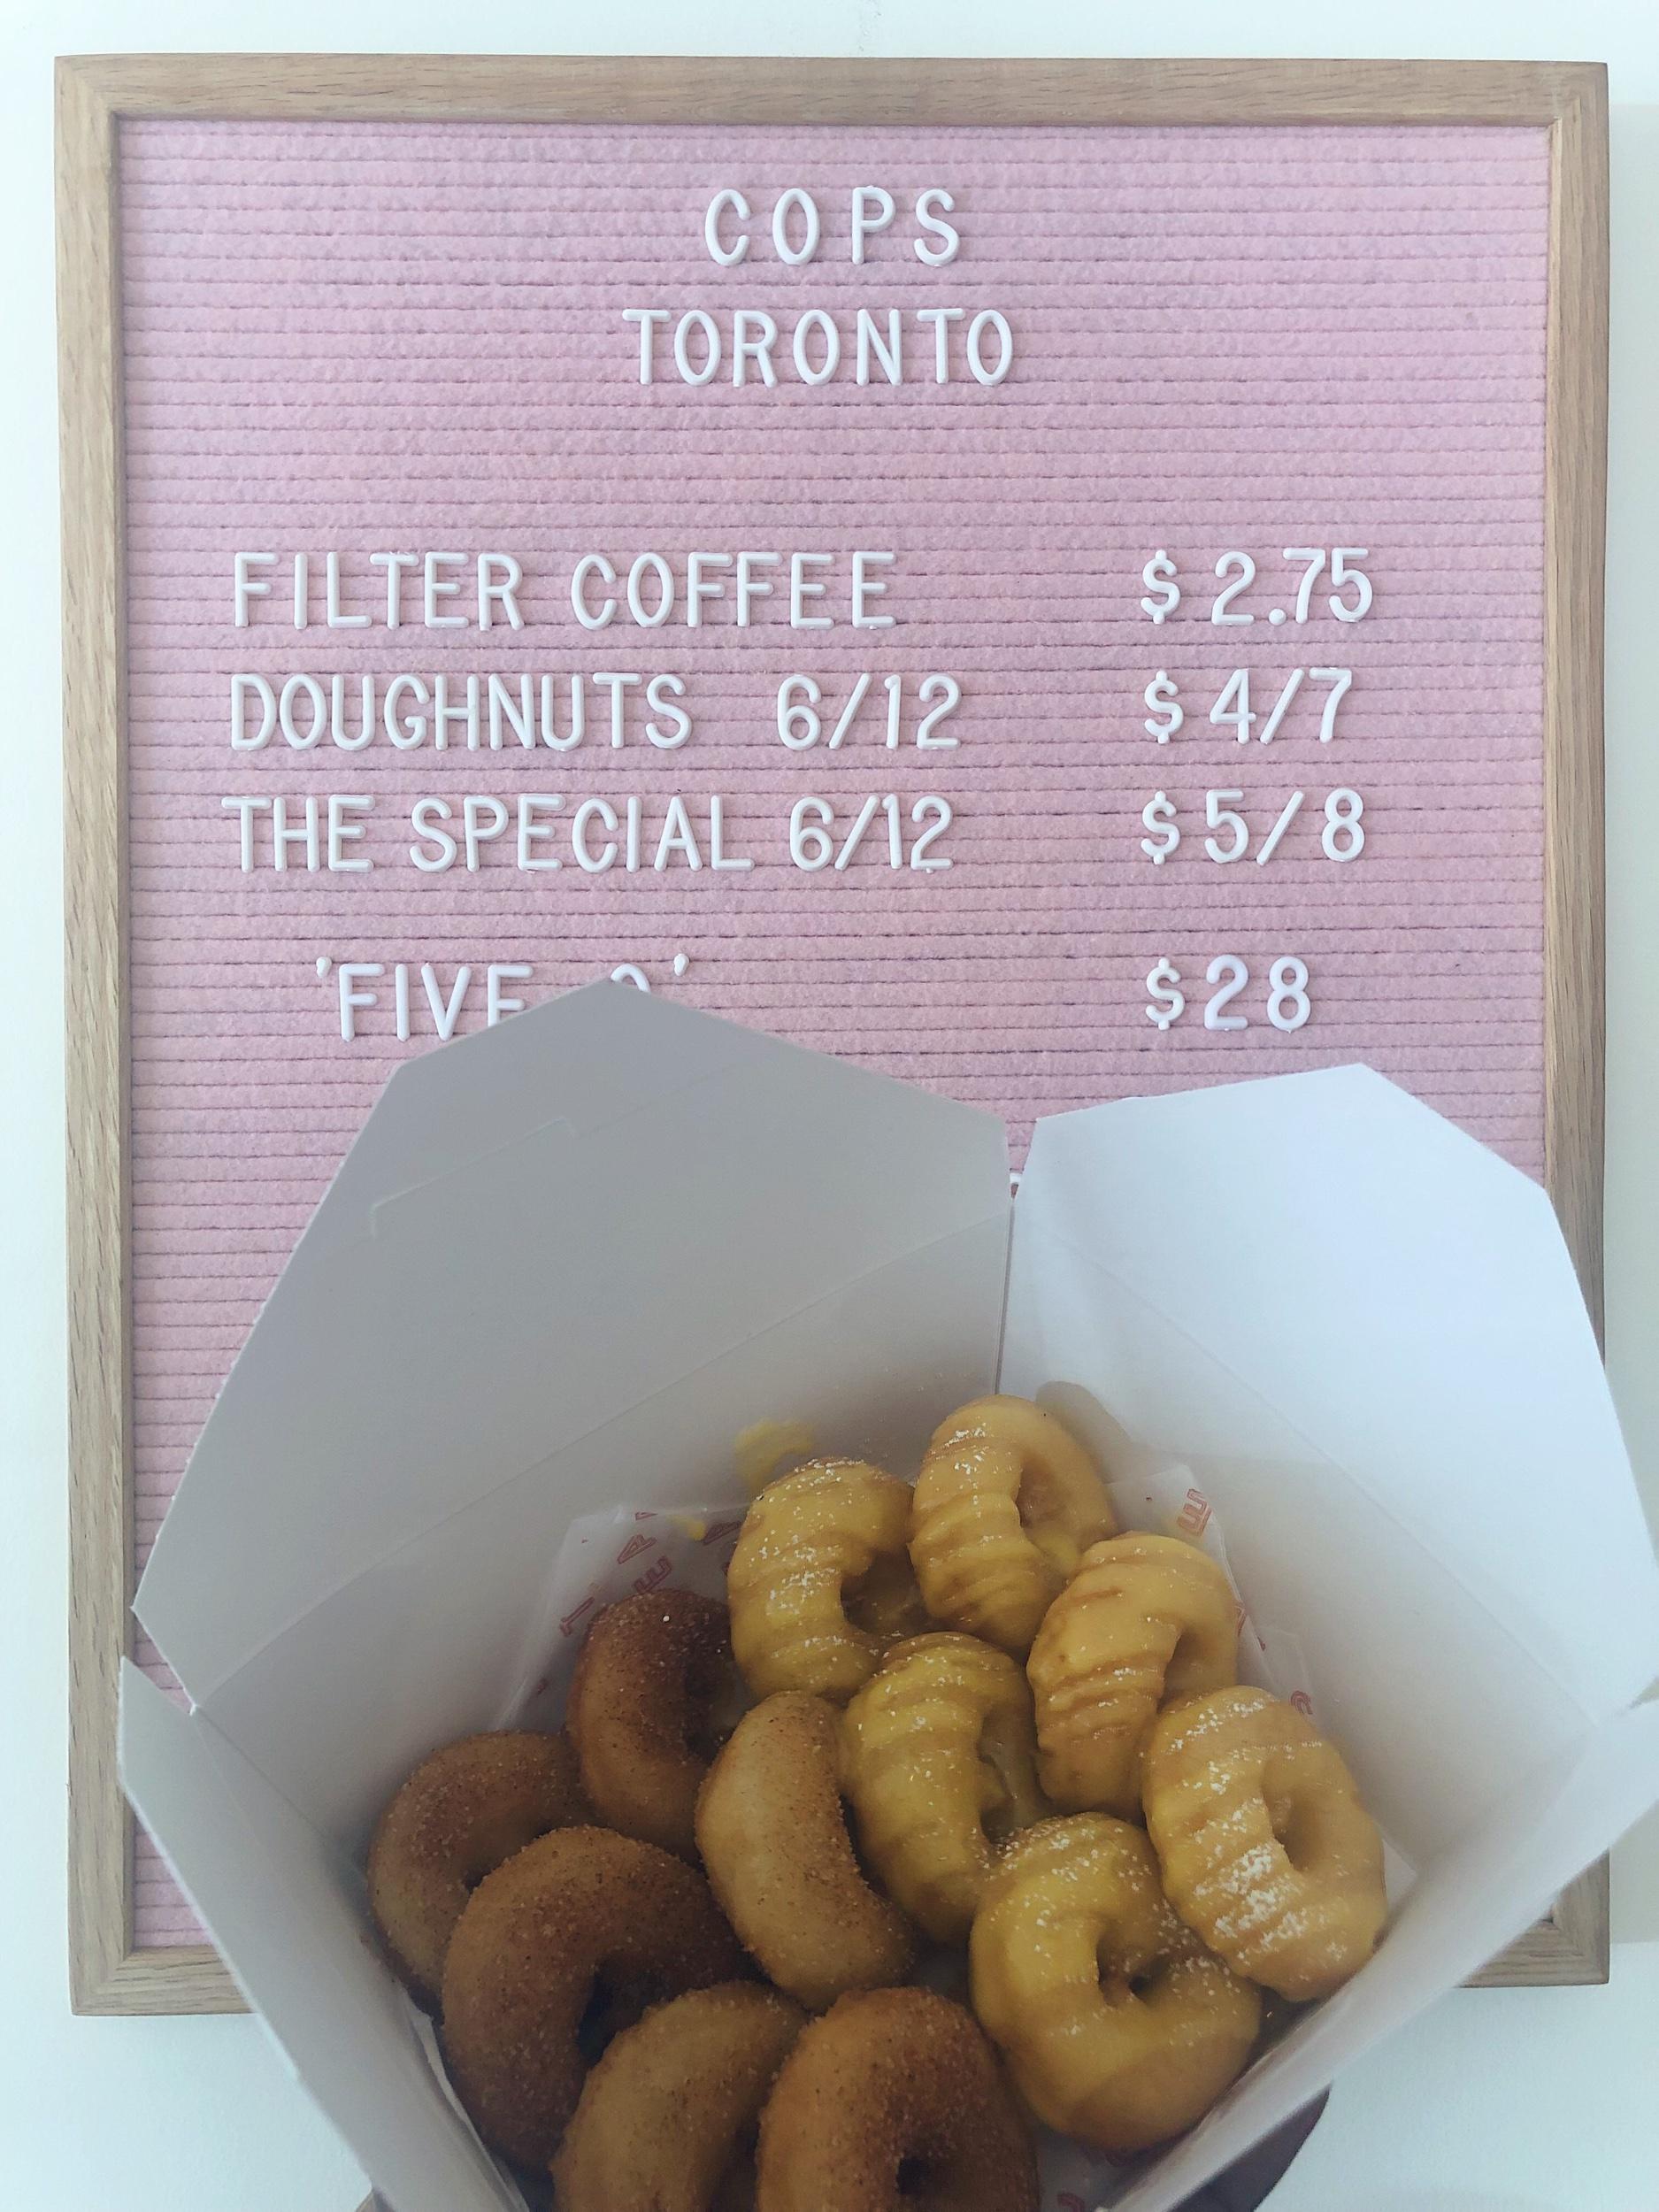 Cinnamon & Mango Lassi donuts from Cops